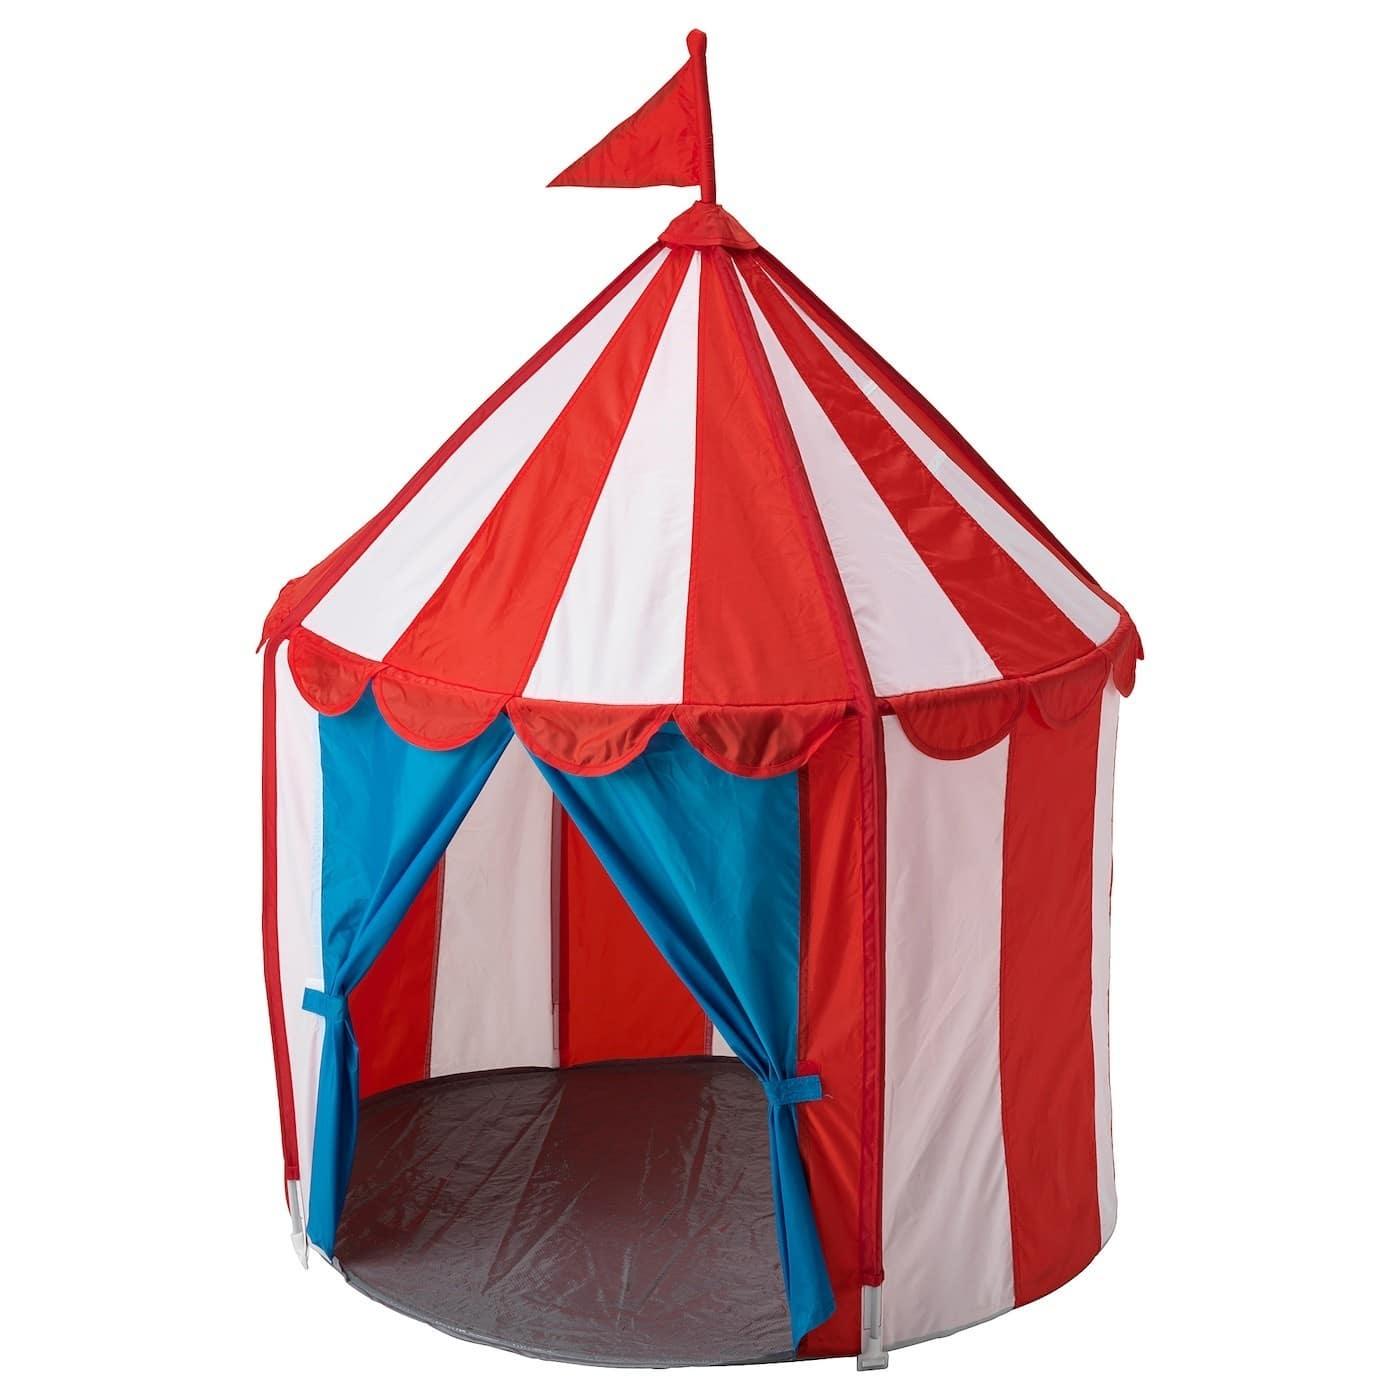 cirkustaelt-children-s-tent__0710148_PE727349_S5